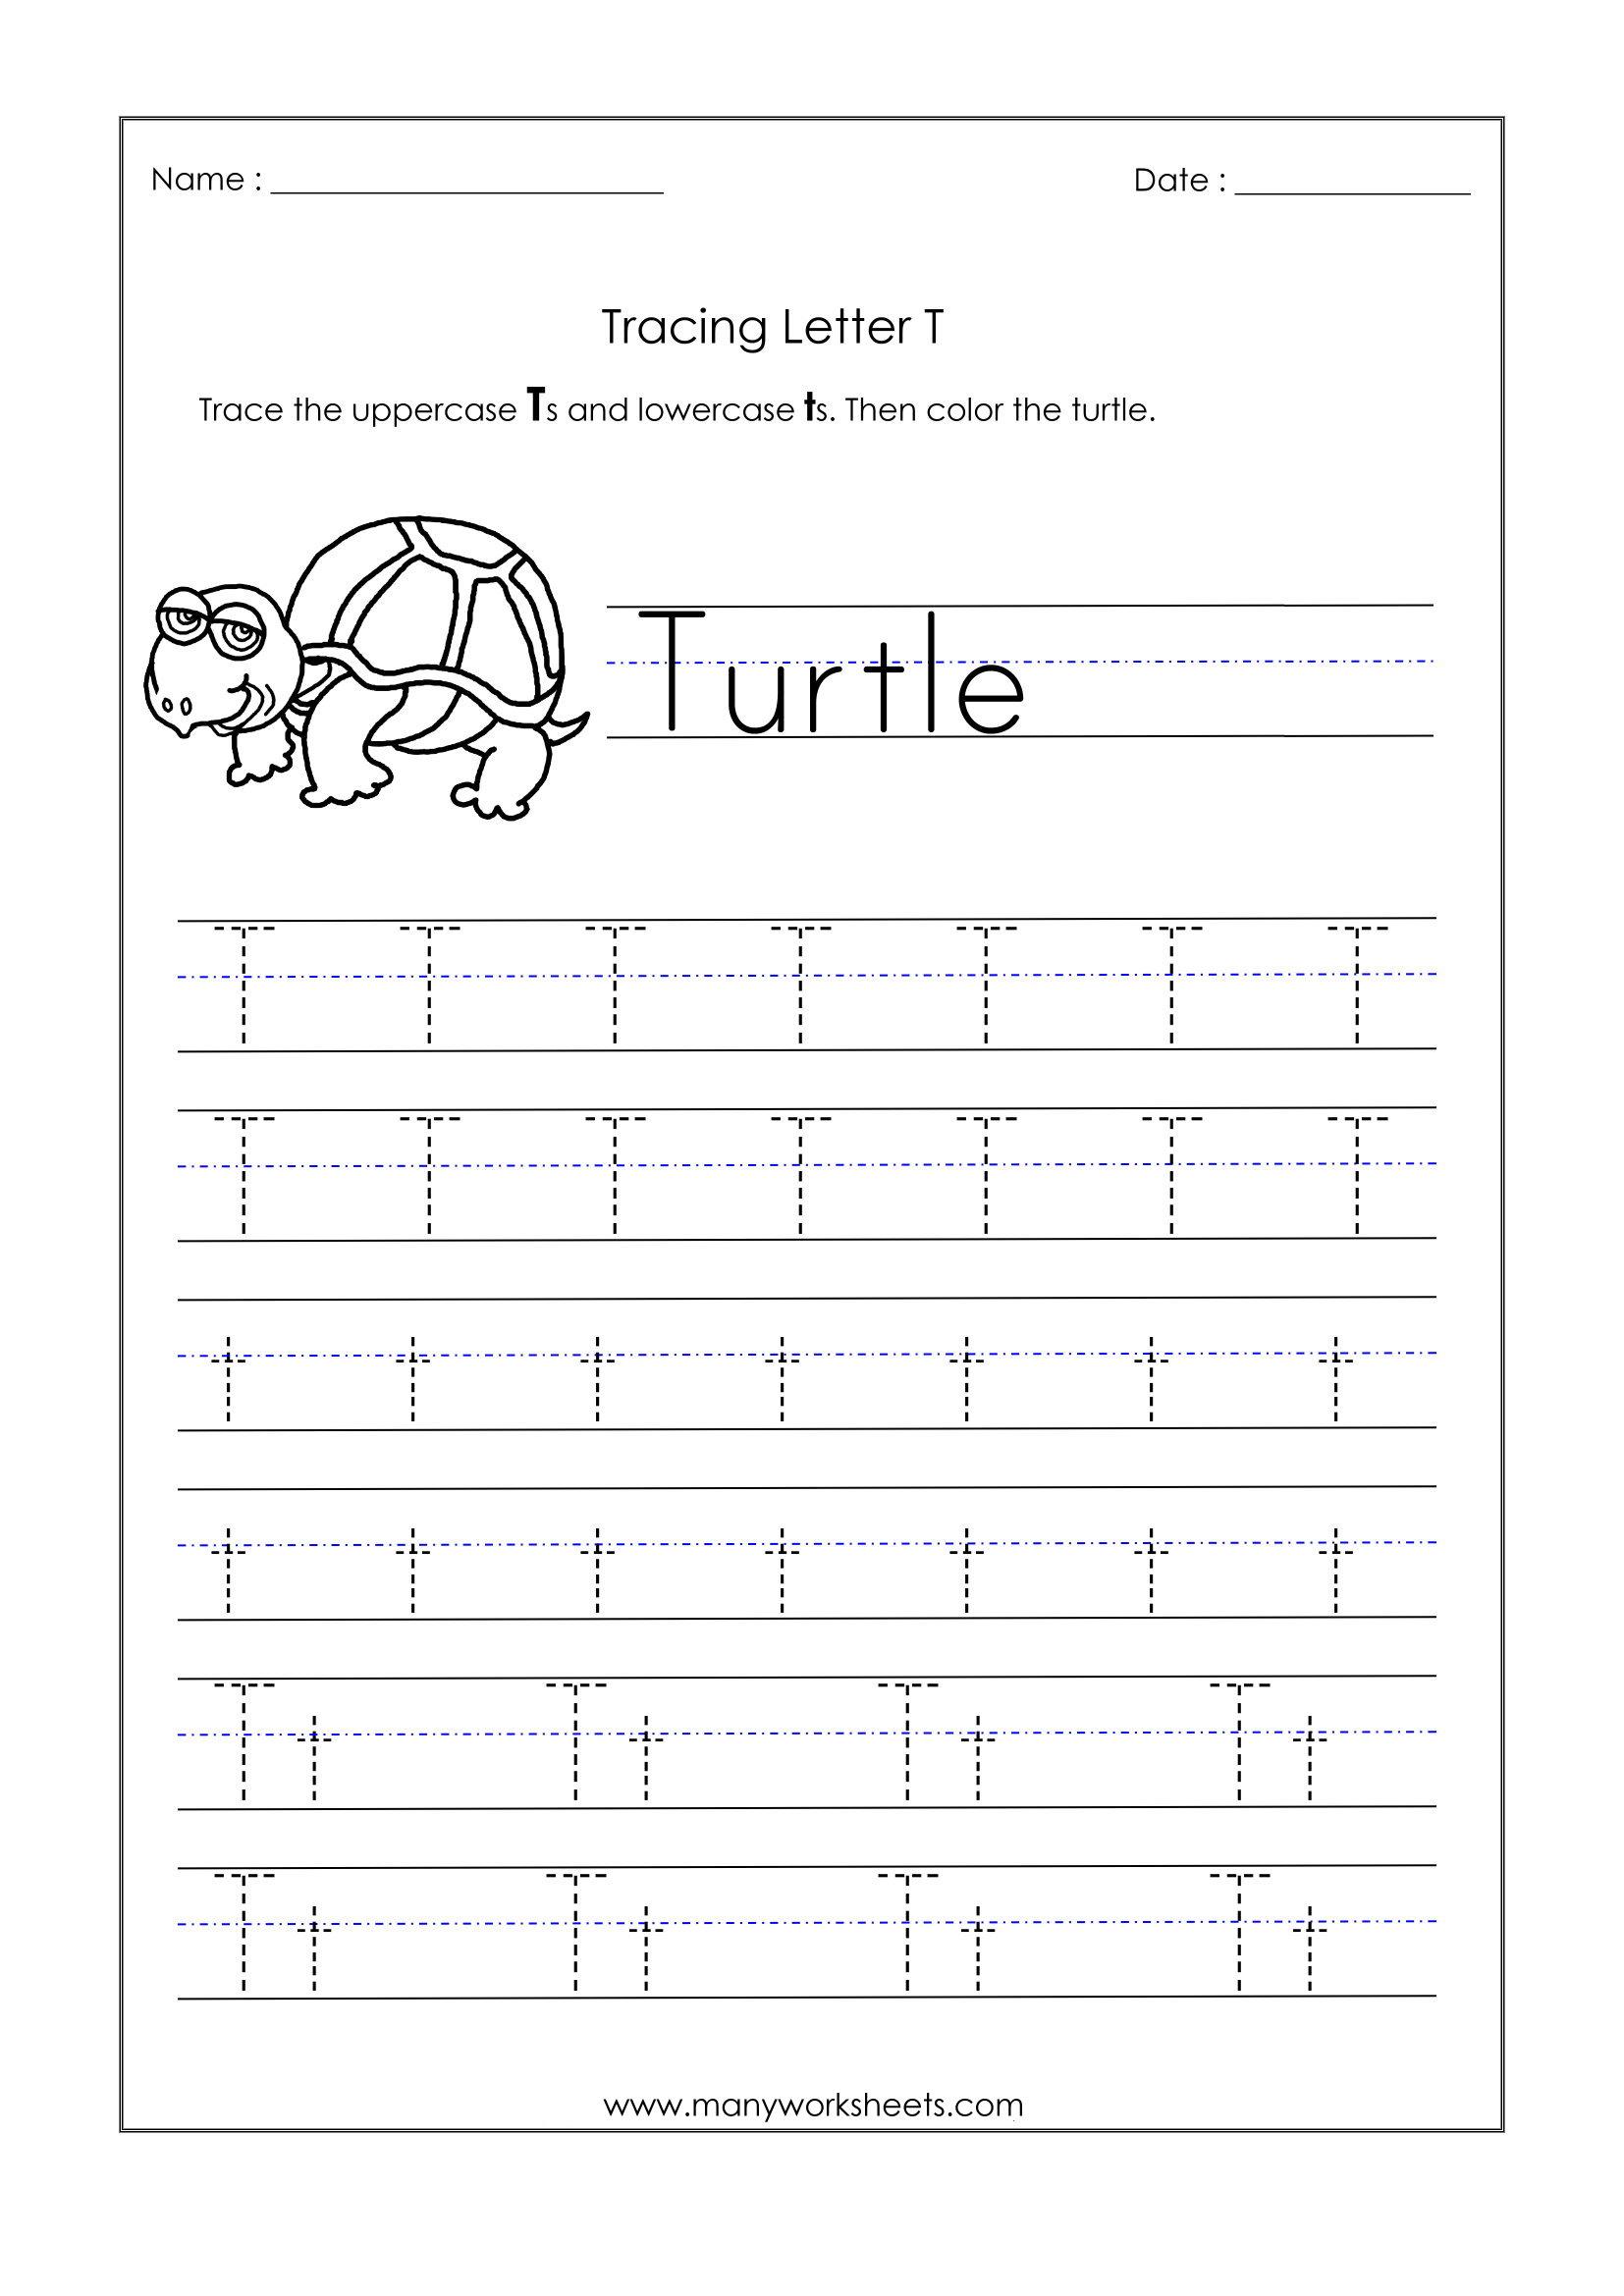 Math Worksheet : Phenomenal Alphabet Writing Worksheetsor with regard to Letter T Tracing Sheet